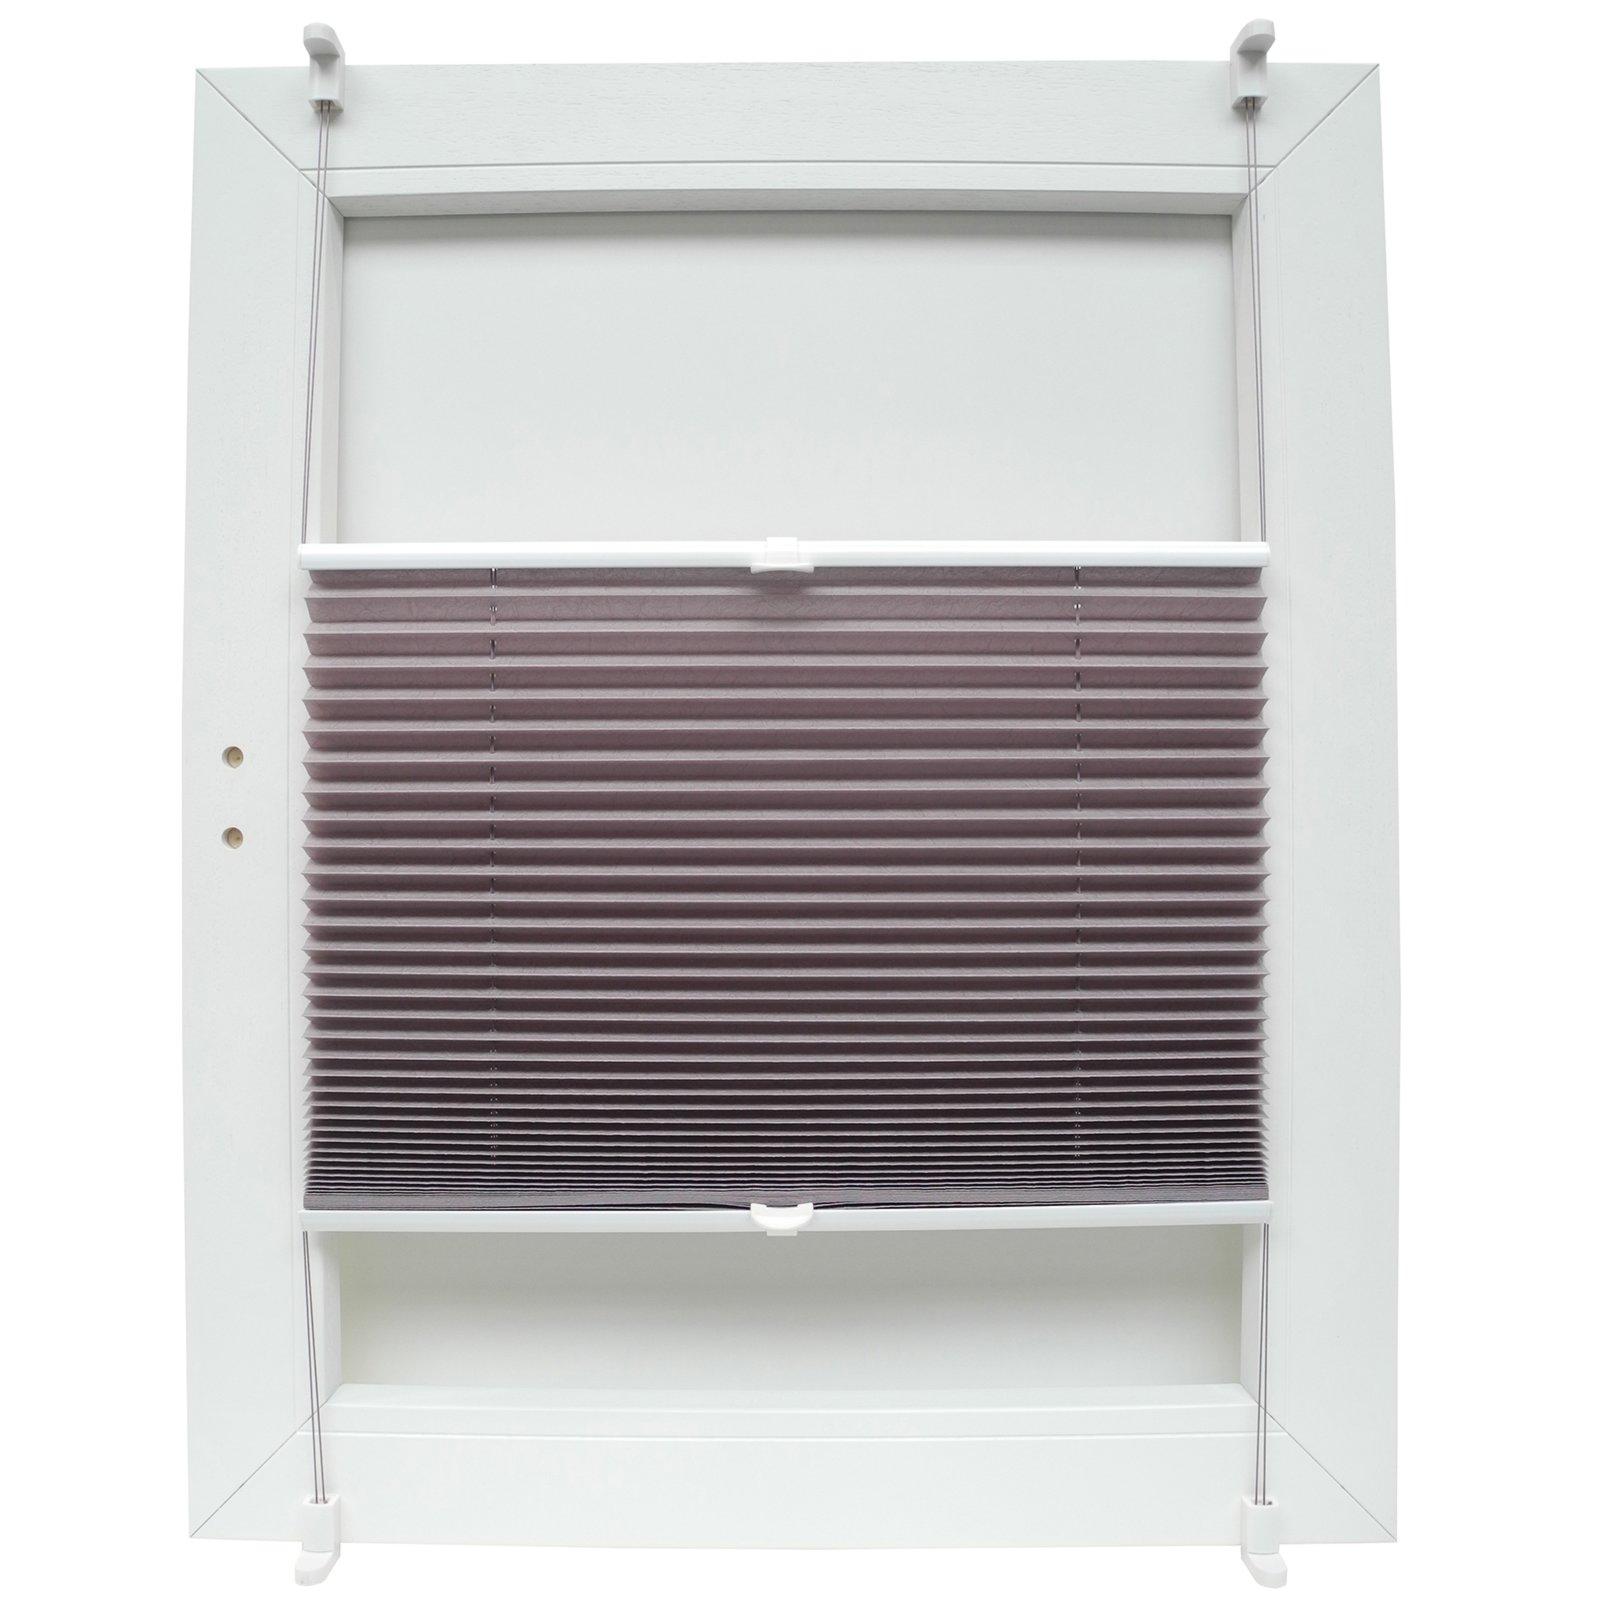 plissee sahara mauve 70x130 cm plissees rollos jalousien deko haushalt roller. Black Bedroom Furniture Sets. Home Design Ideas